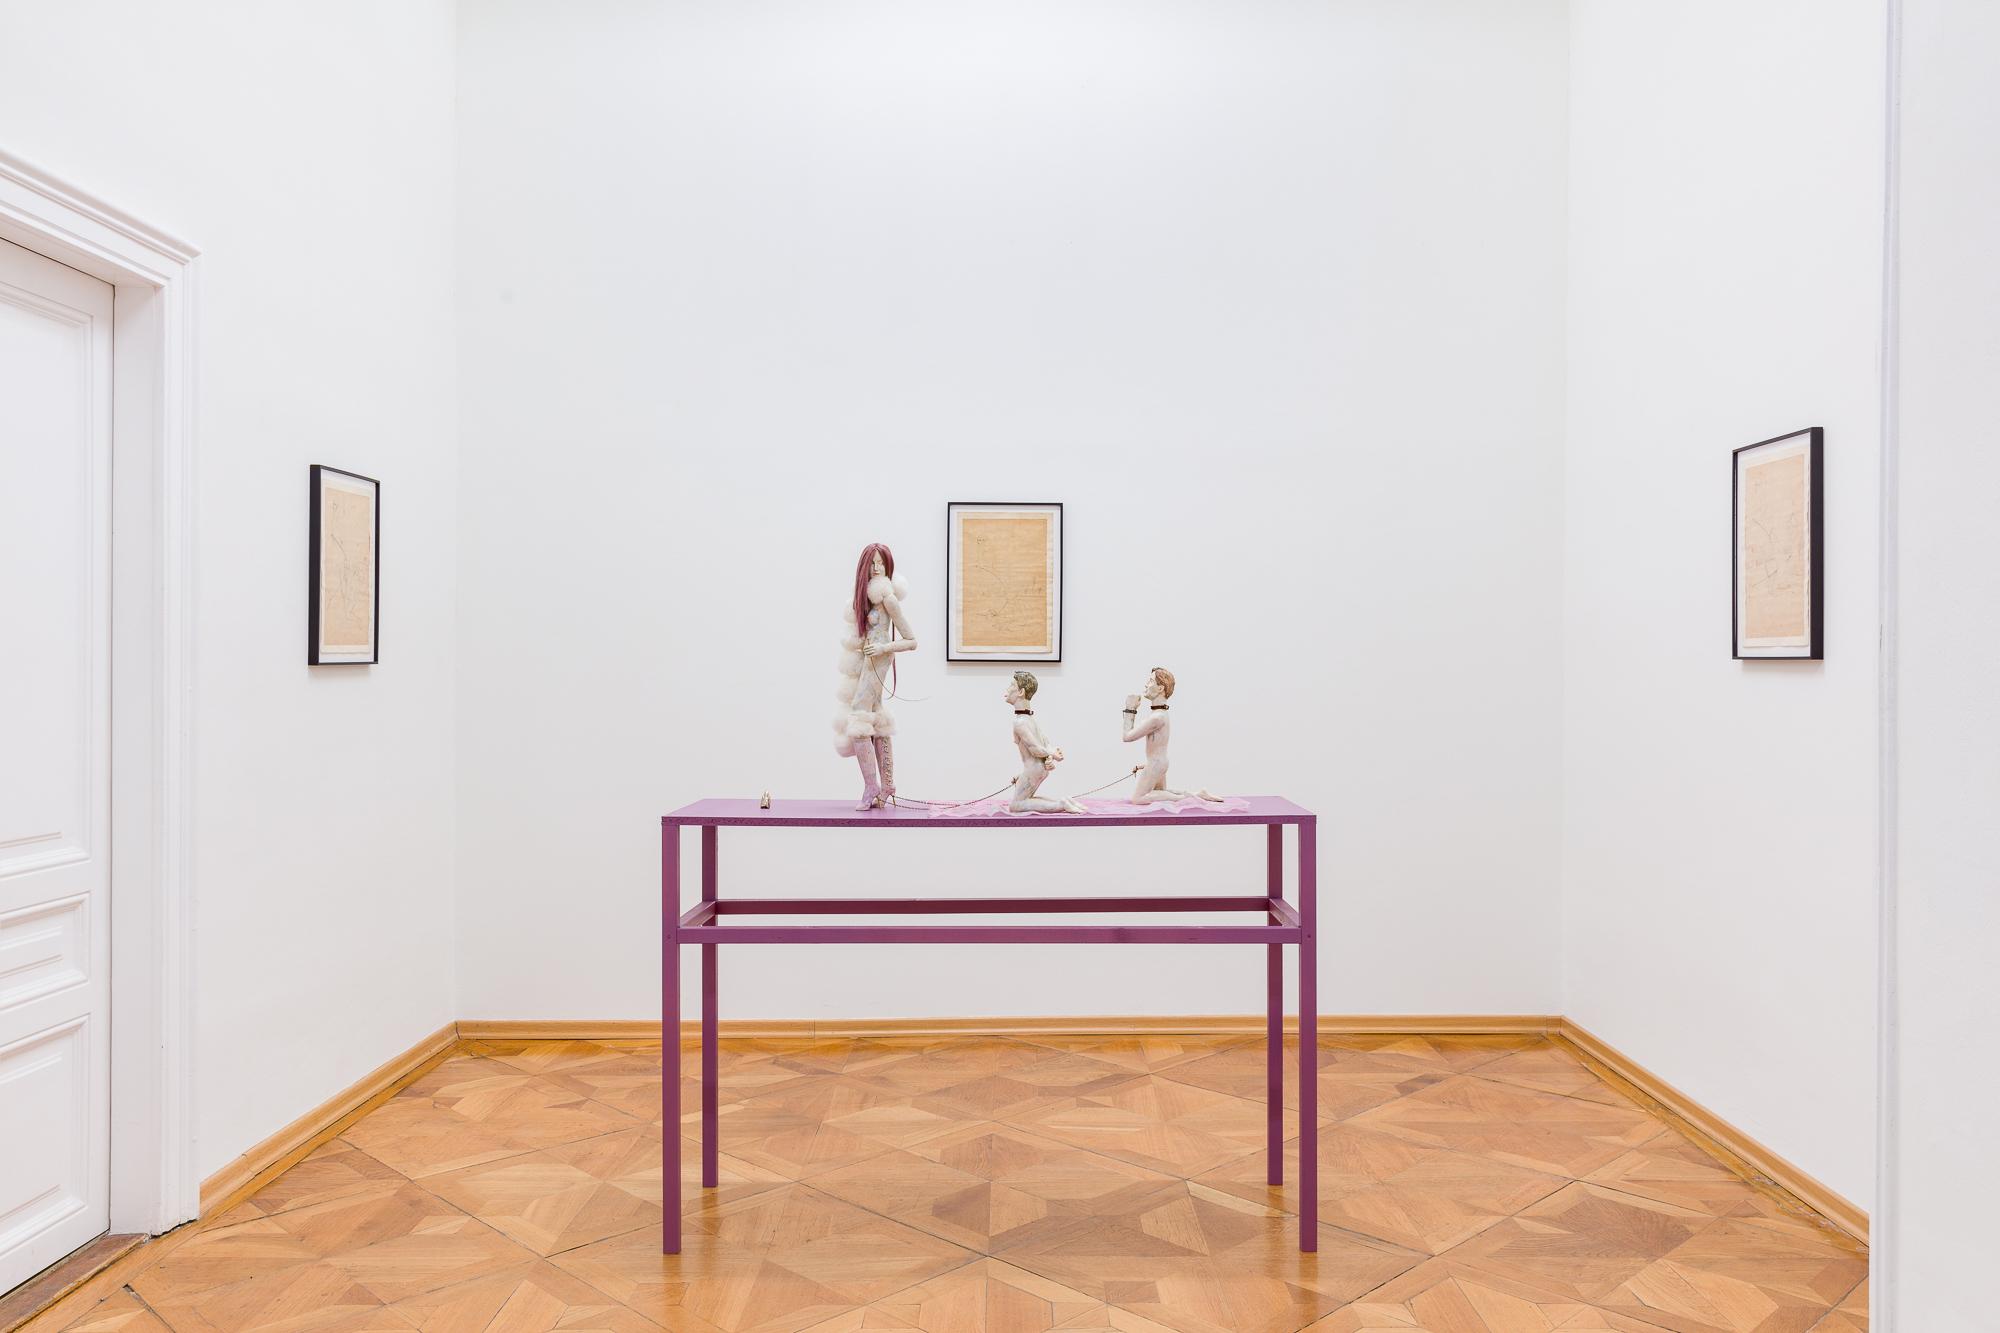 2018_11_22_Zoe Barcza & Soshiro Matsubara at Croy Nielsen by kunstdokumentationcom_001_web.jpg